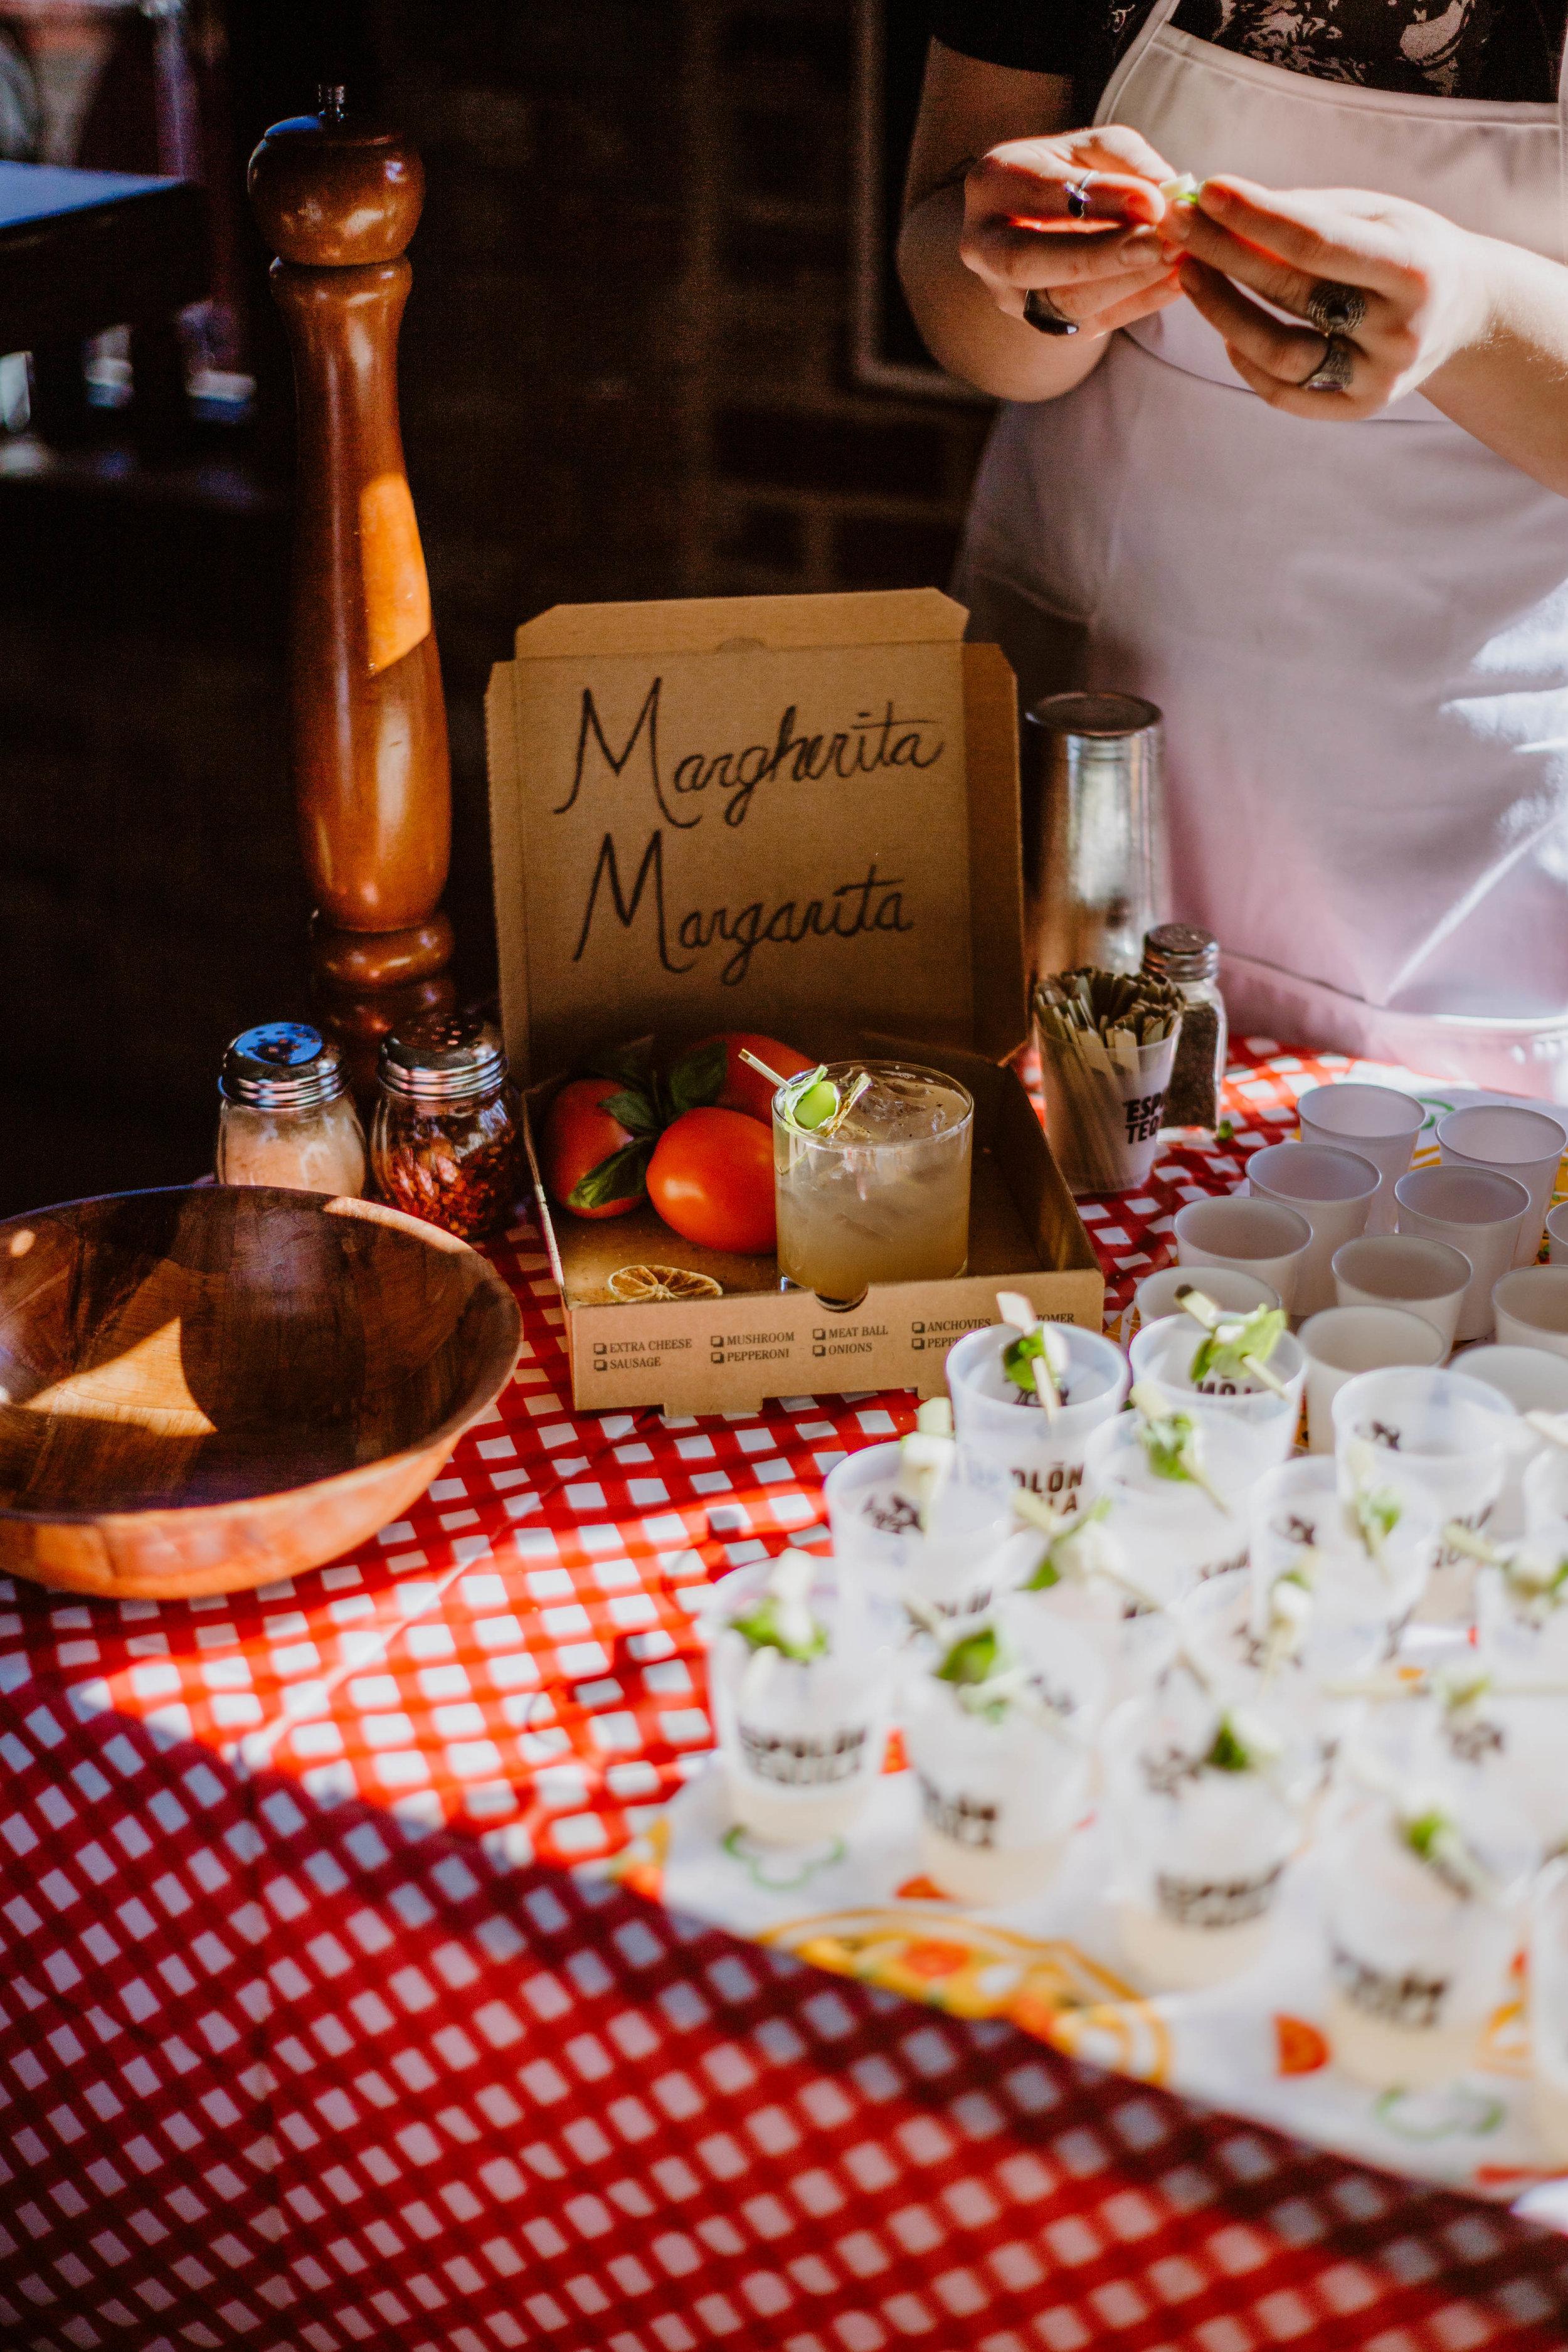 Paschall's Margherita Margarita